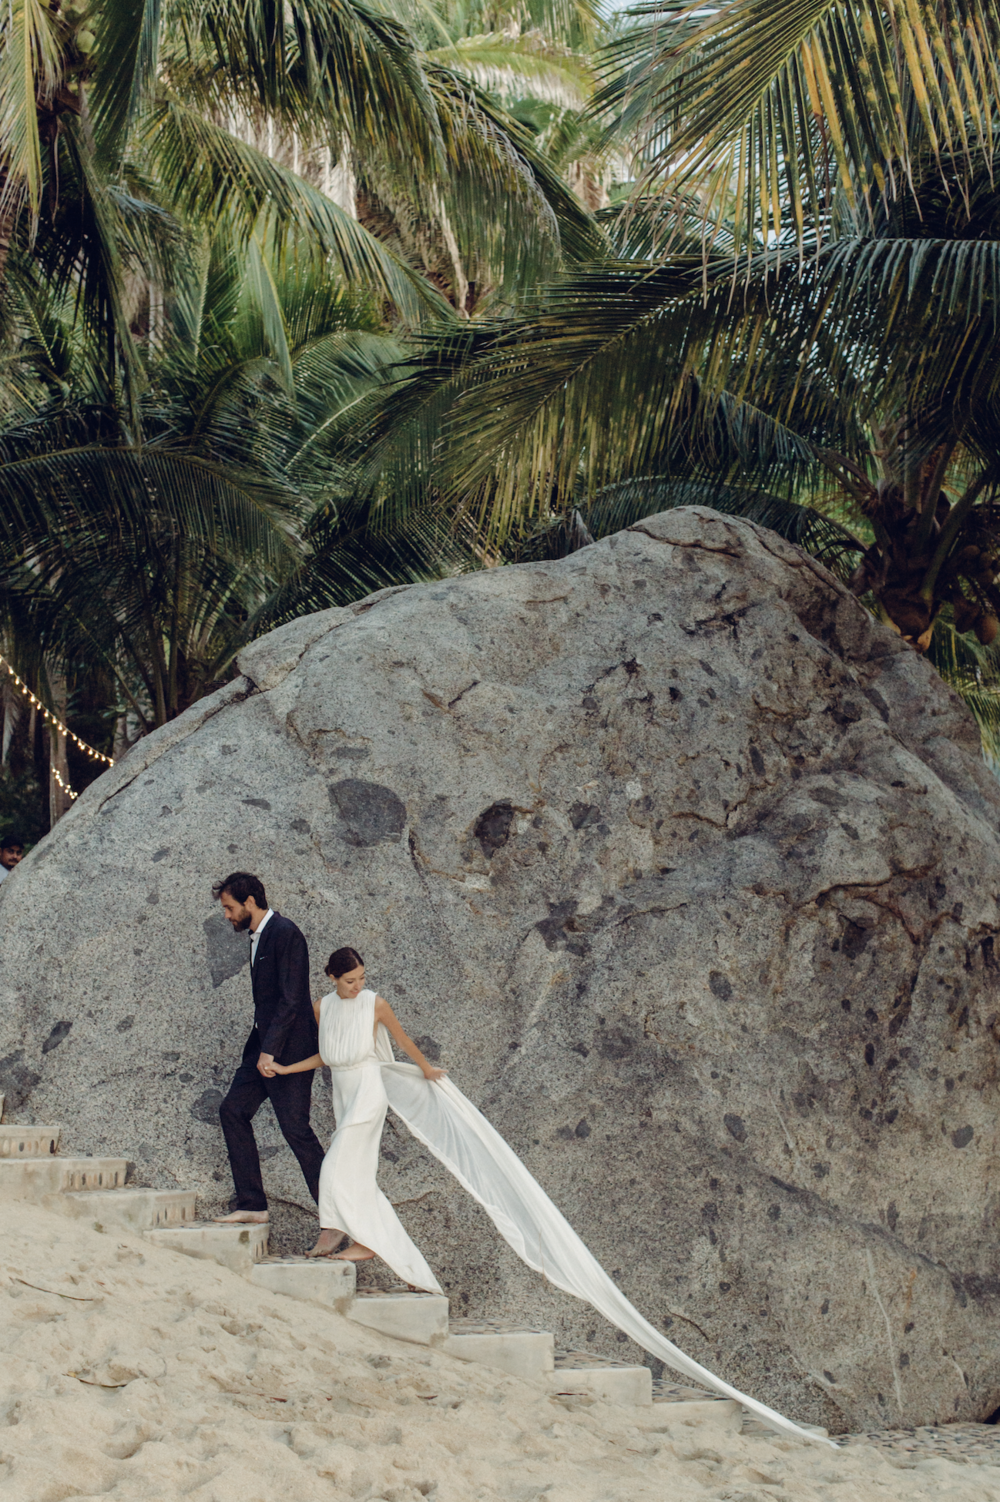 HAILLEY+HOWARD+DESTINATION+WEDDING+PHOTOGRAPHER_SAYULITA+WEDDING+PHOTOGRAPHER+MEXICO.png